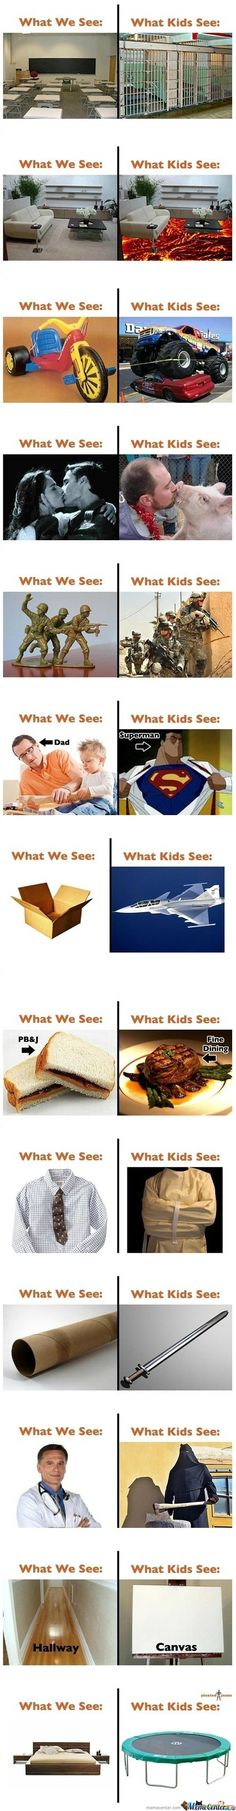 Adults vs. Kids. So true.